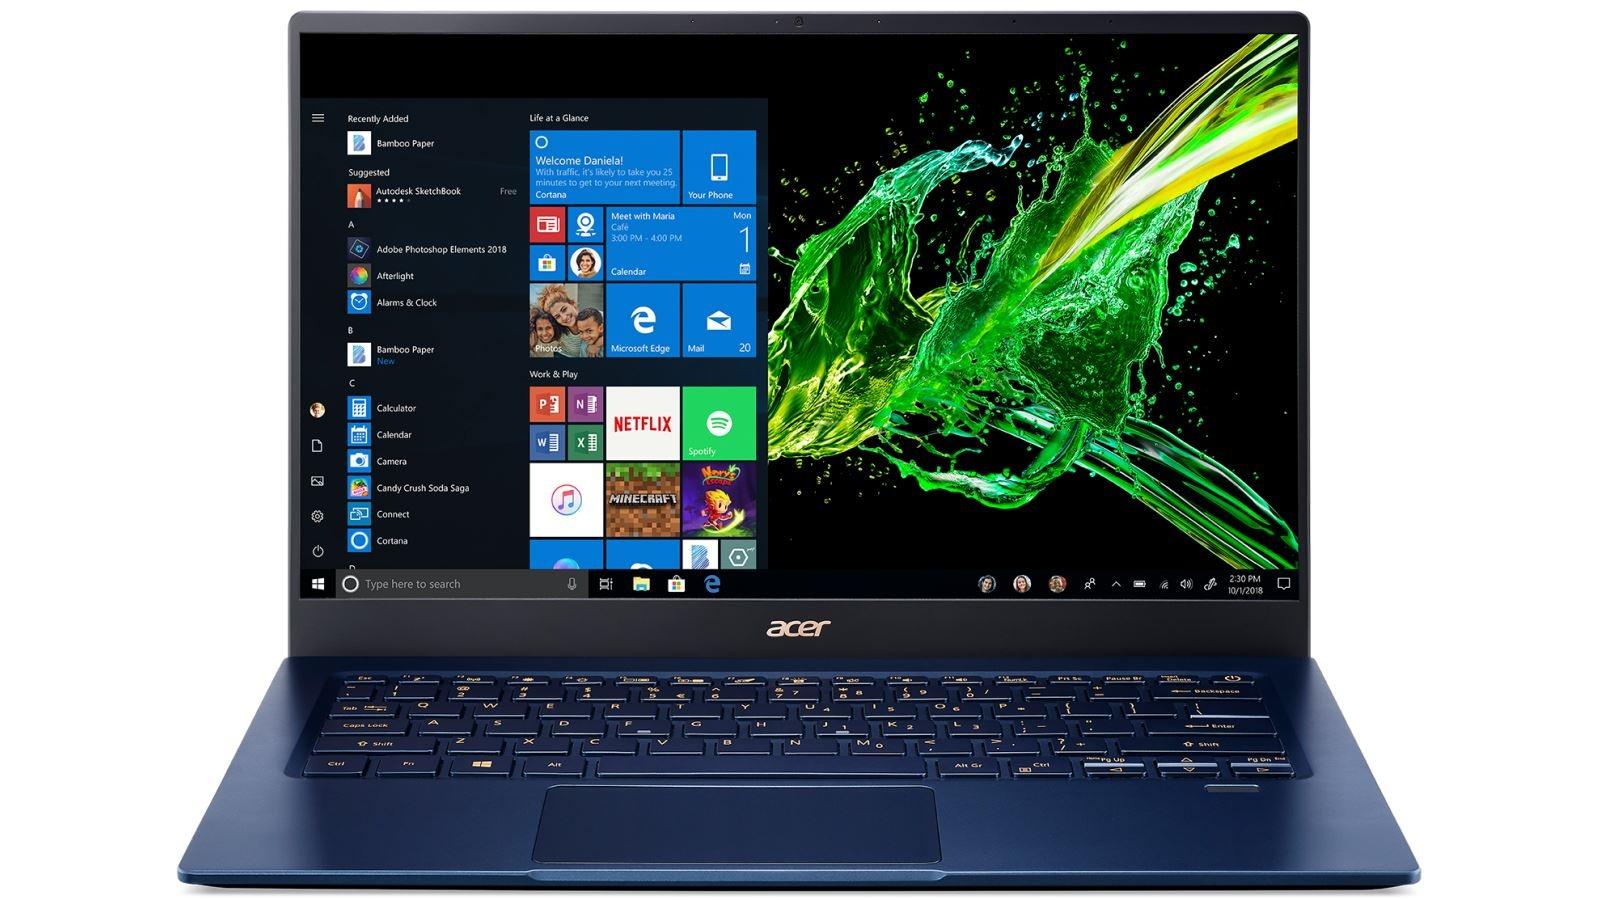 Hot Deals Acer Swift 5 14 Inch I5 1035g1 8gb 256gb Ssd Laptop Harvey Norman Au